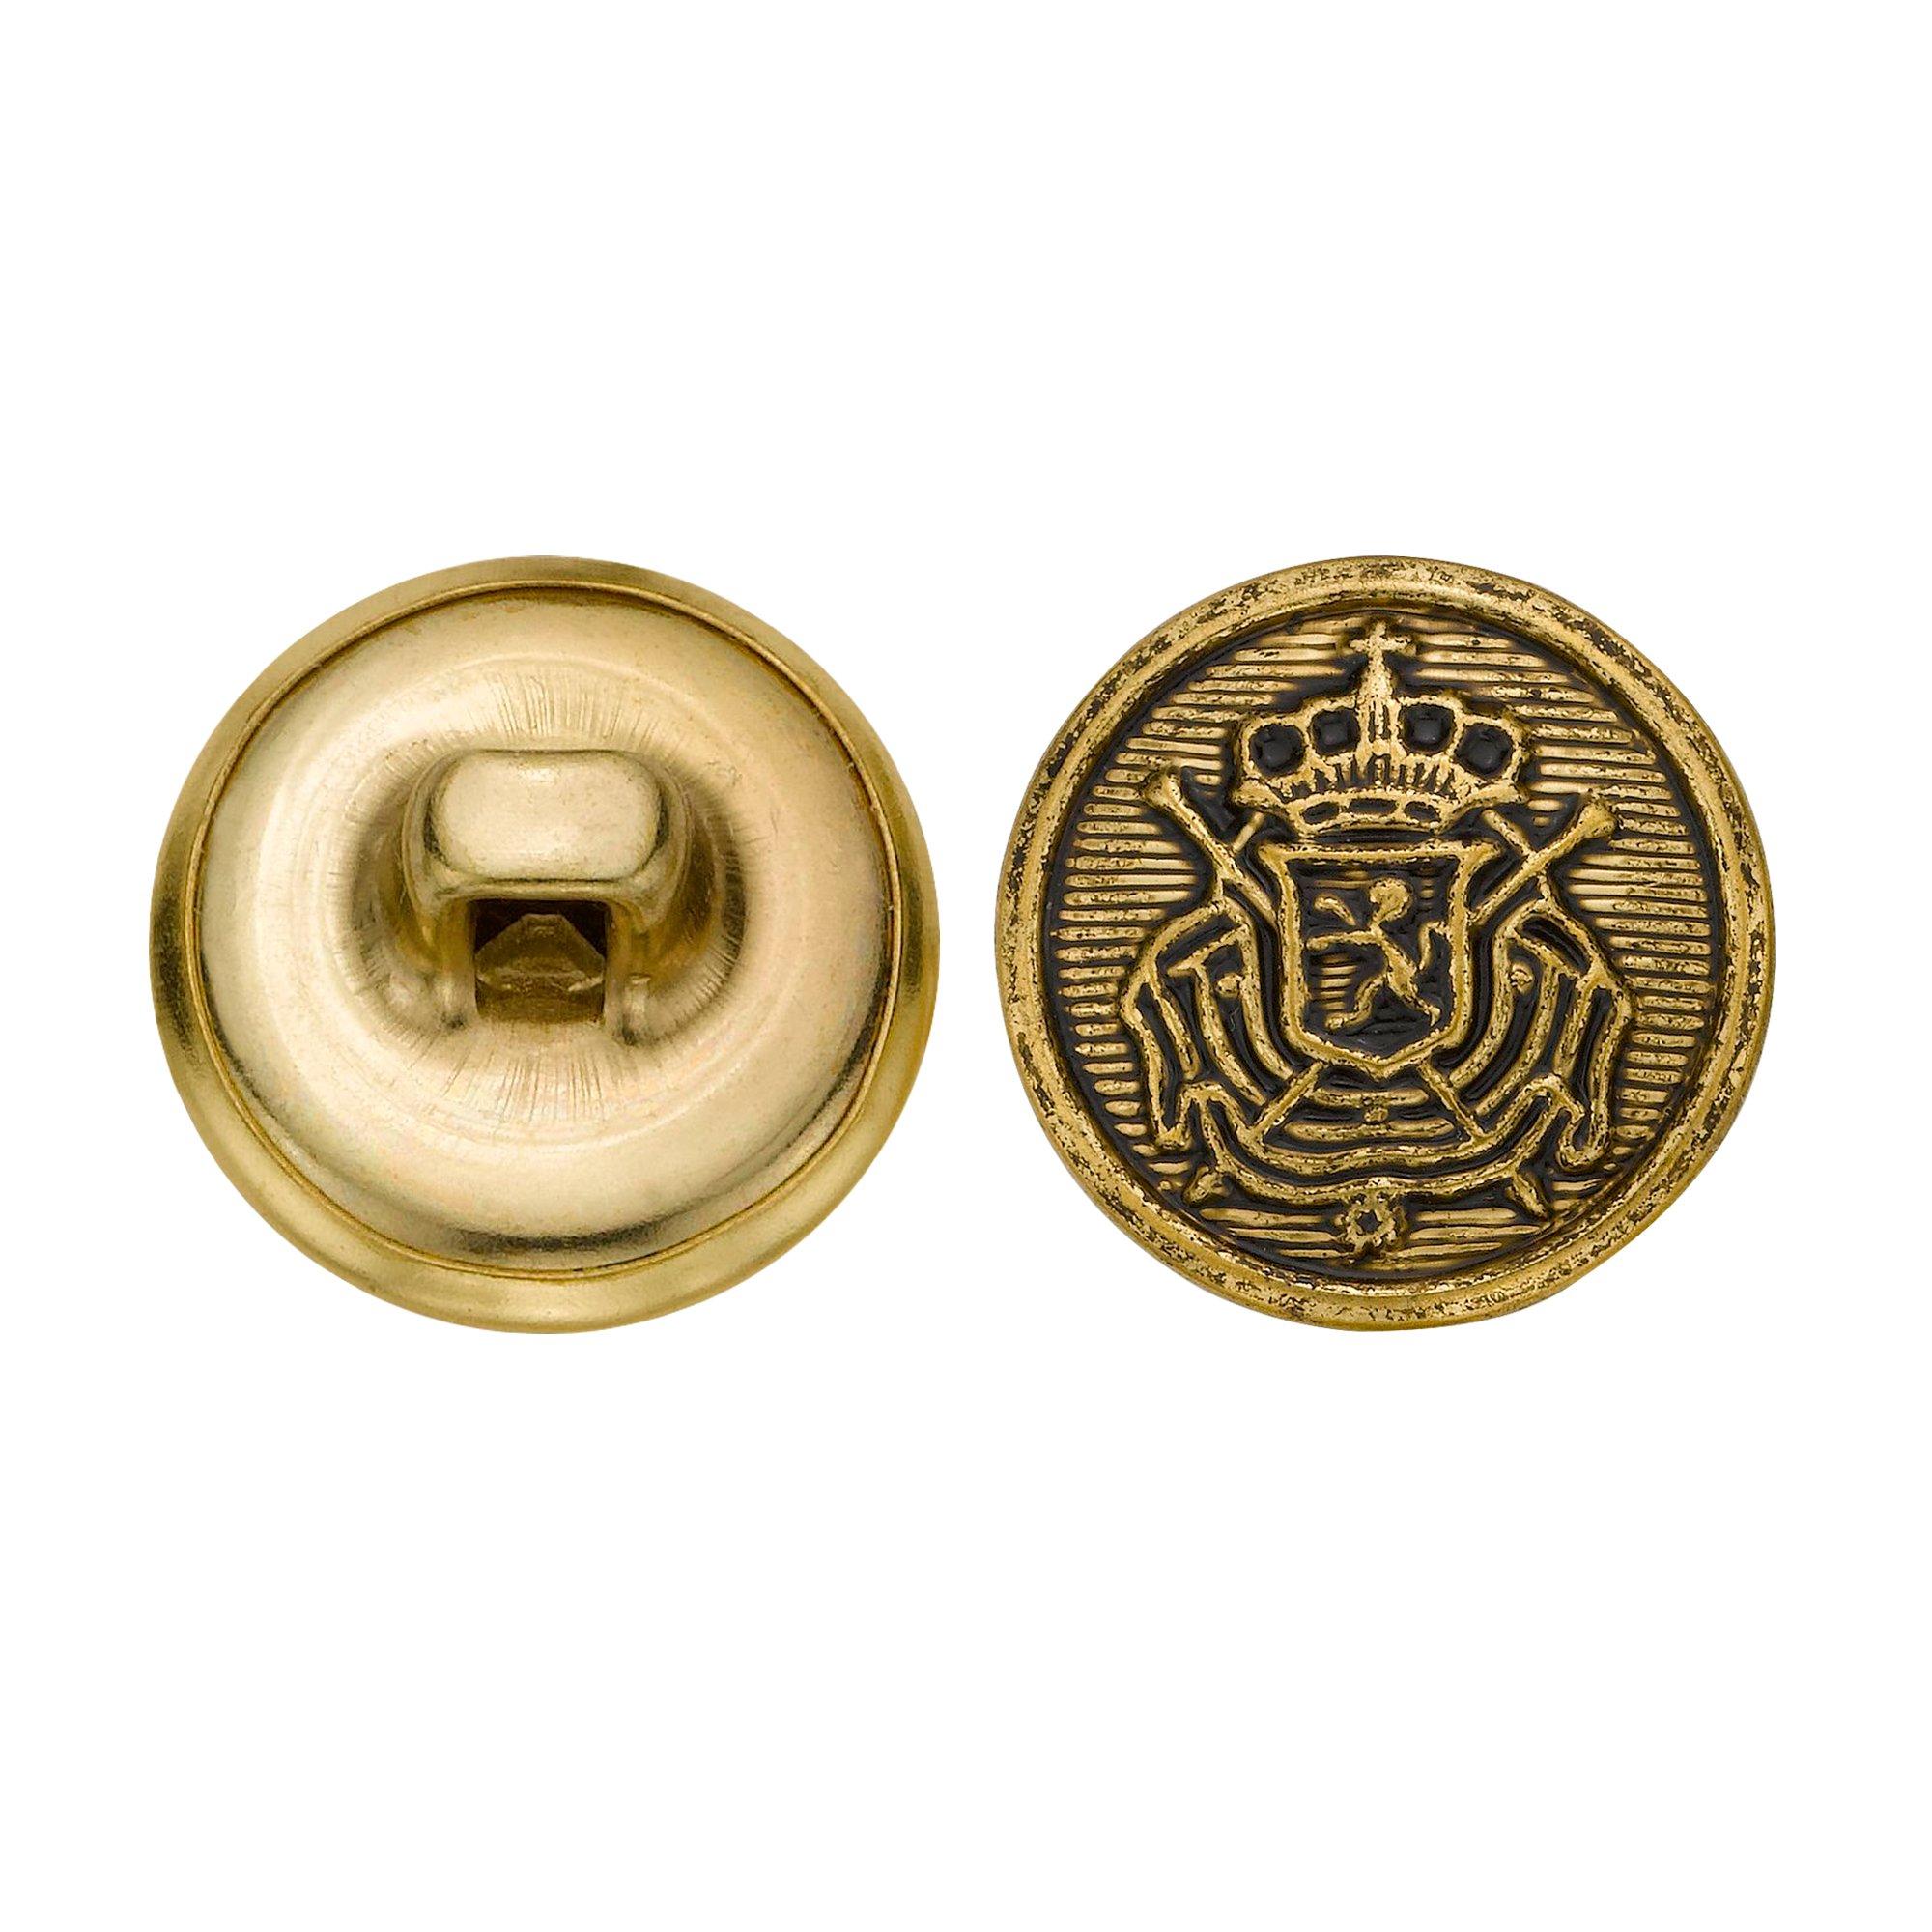 C&C Metal Products 5266 Royal Crest Metal Button, Size 24 Ligne, Antique Gold, 72-Pack